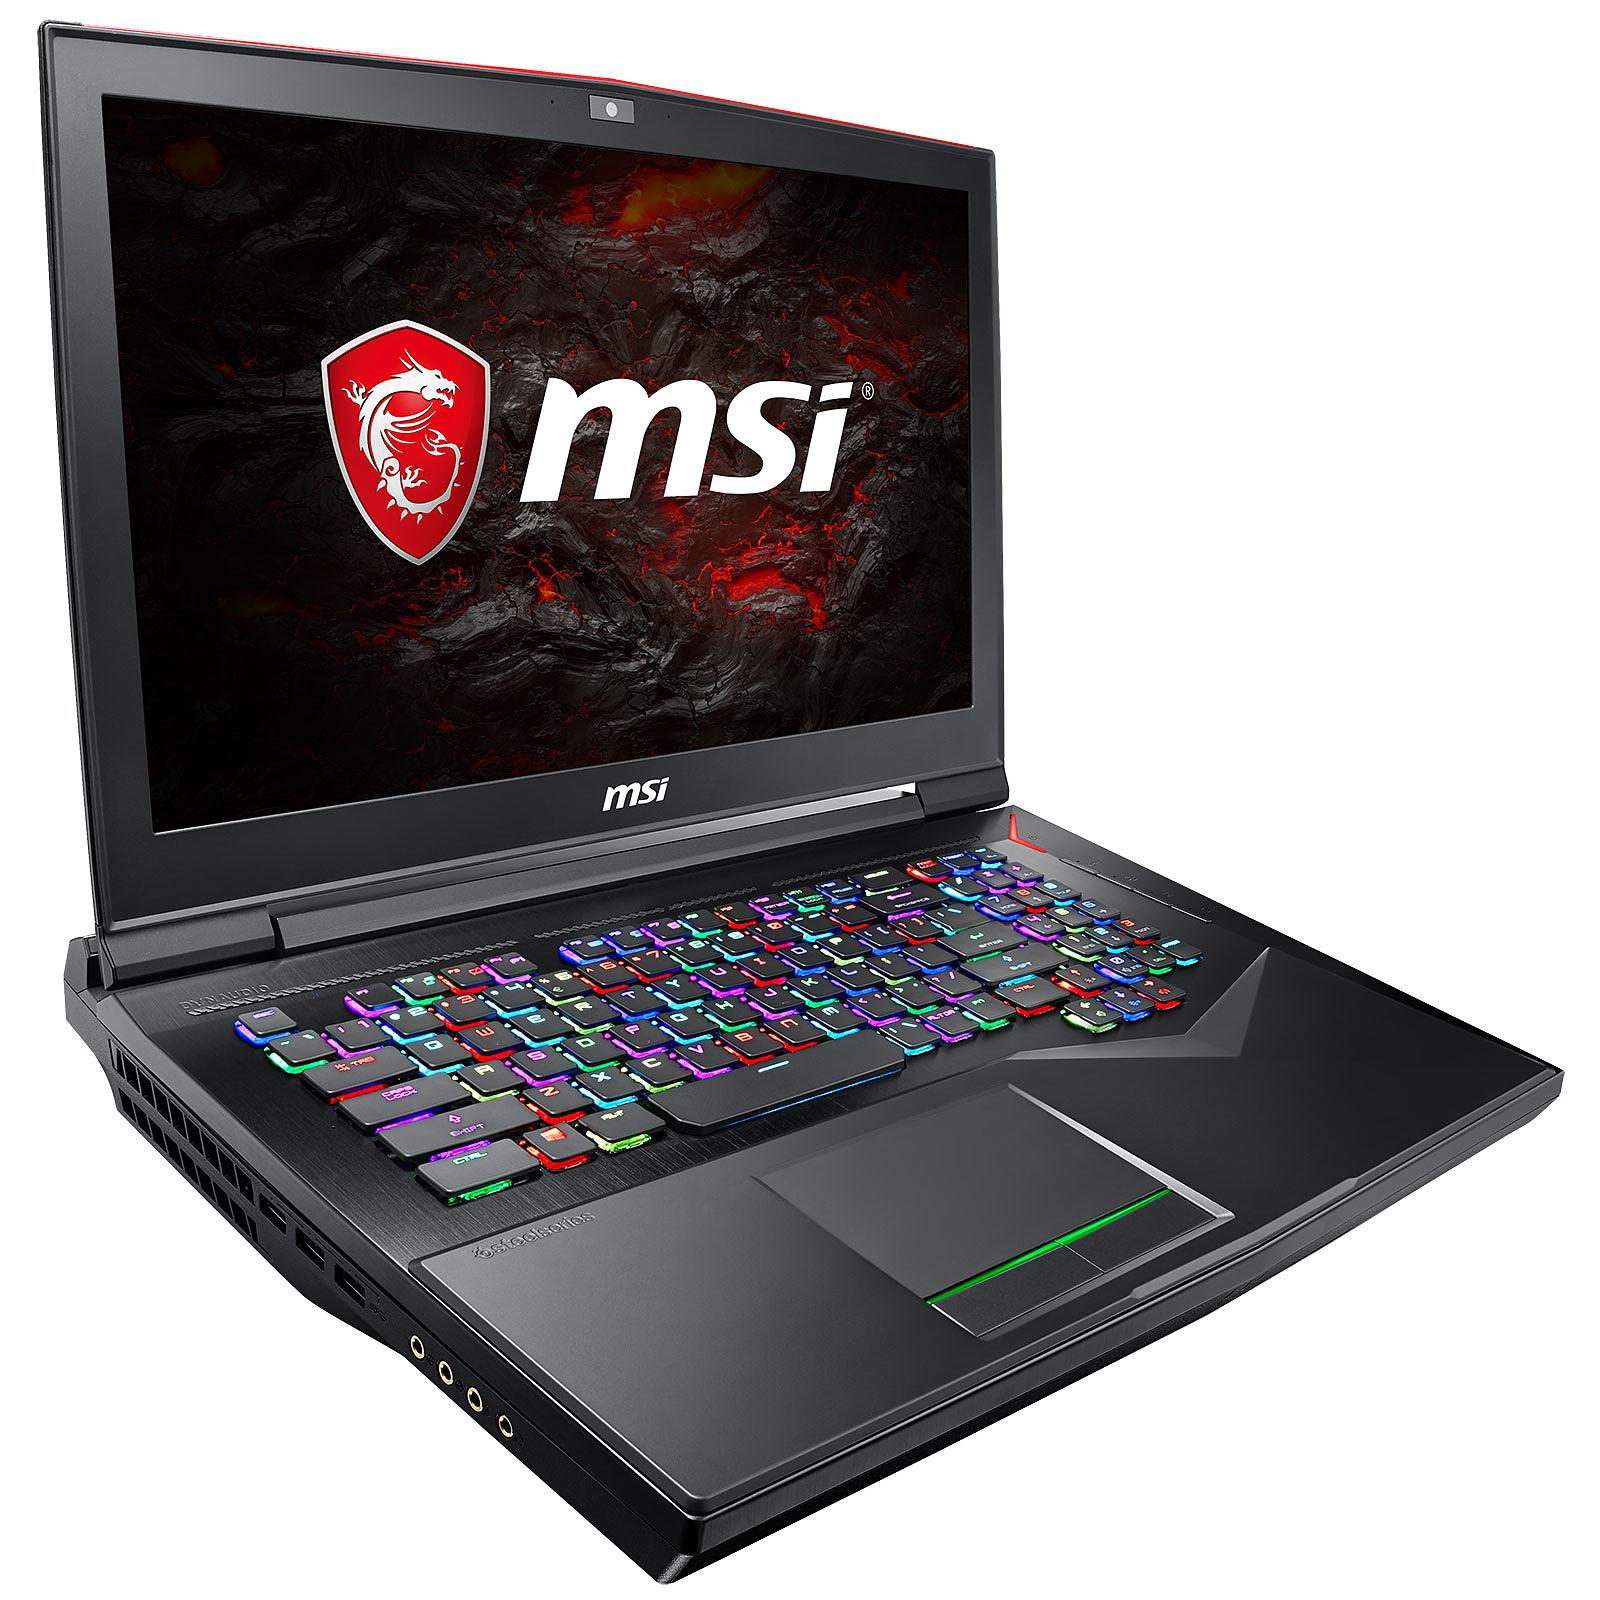 MSI GT75 8RG-015FR Titan